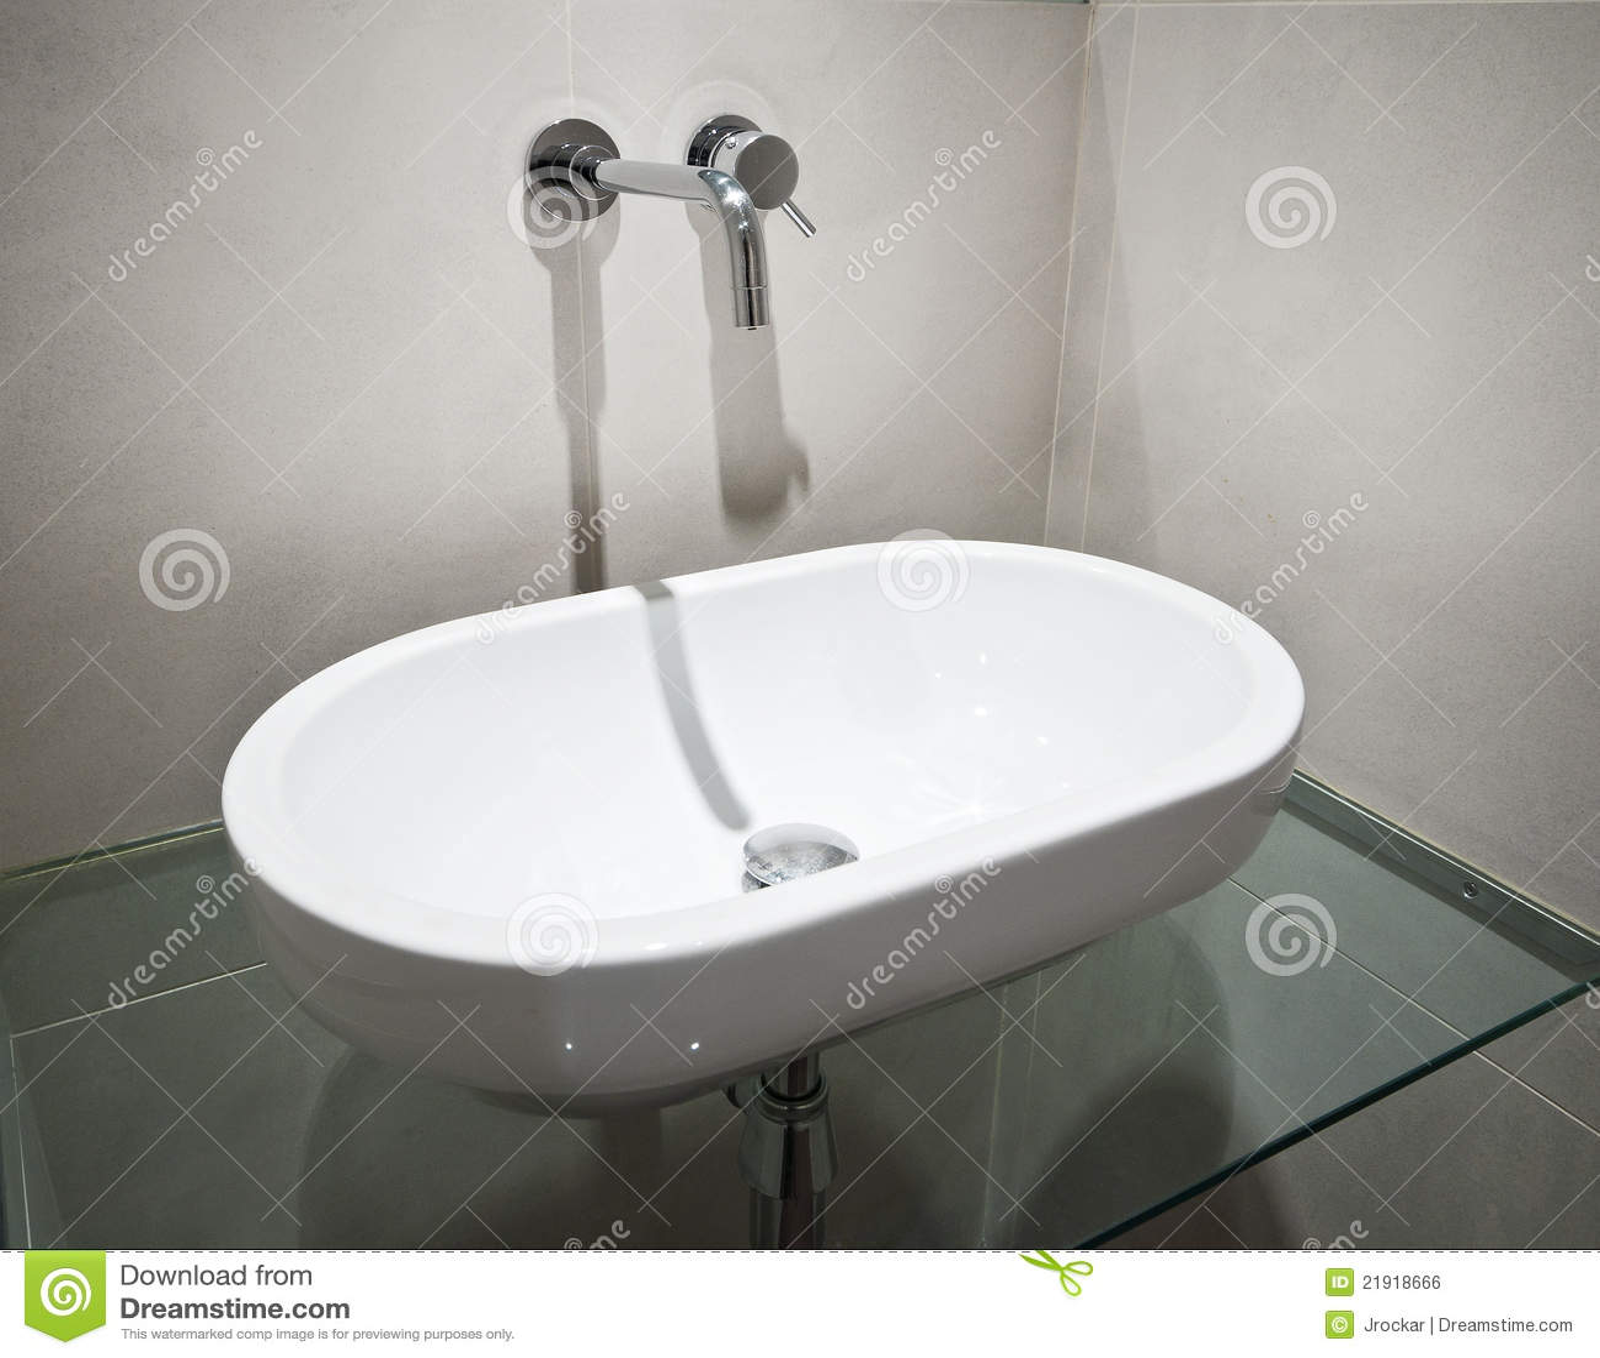 Oval Hand Wash Basin Royalty Free Stock Image Image